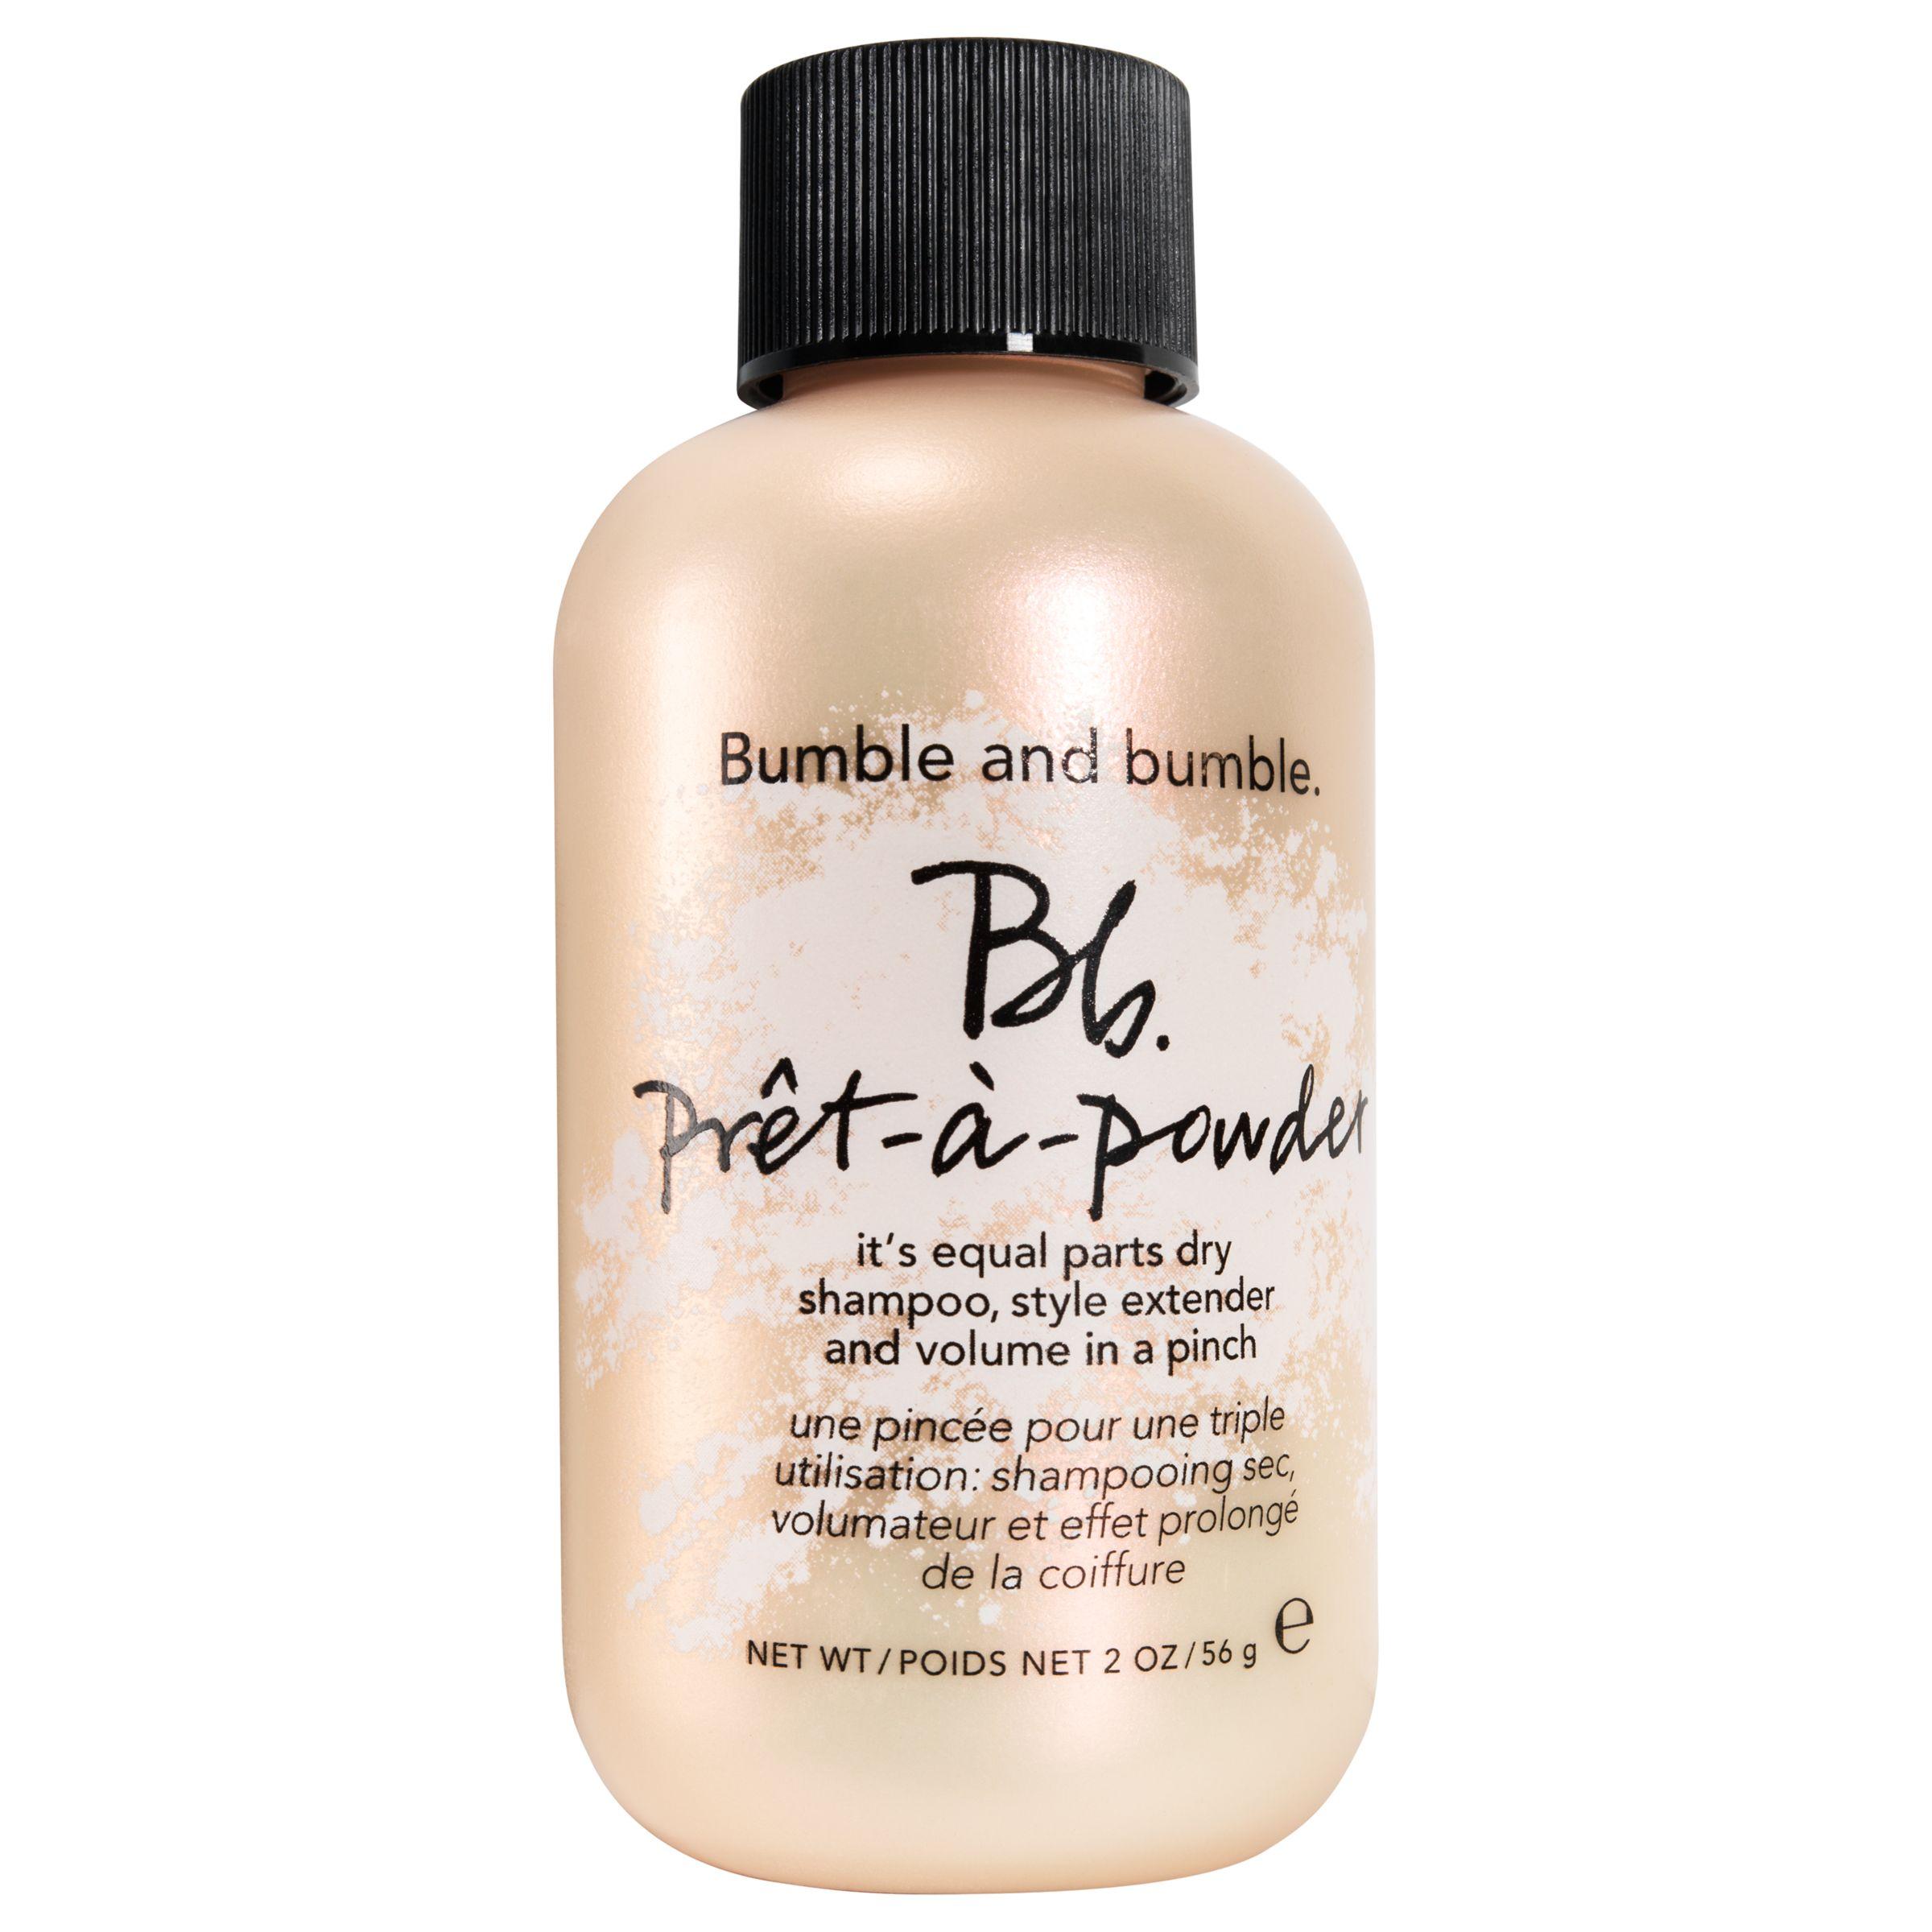 Bumble and bumble Bumble and bumble Pret-a-Powder, 56g